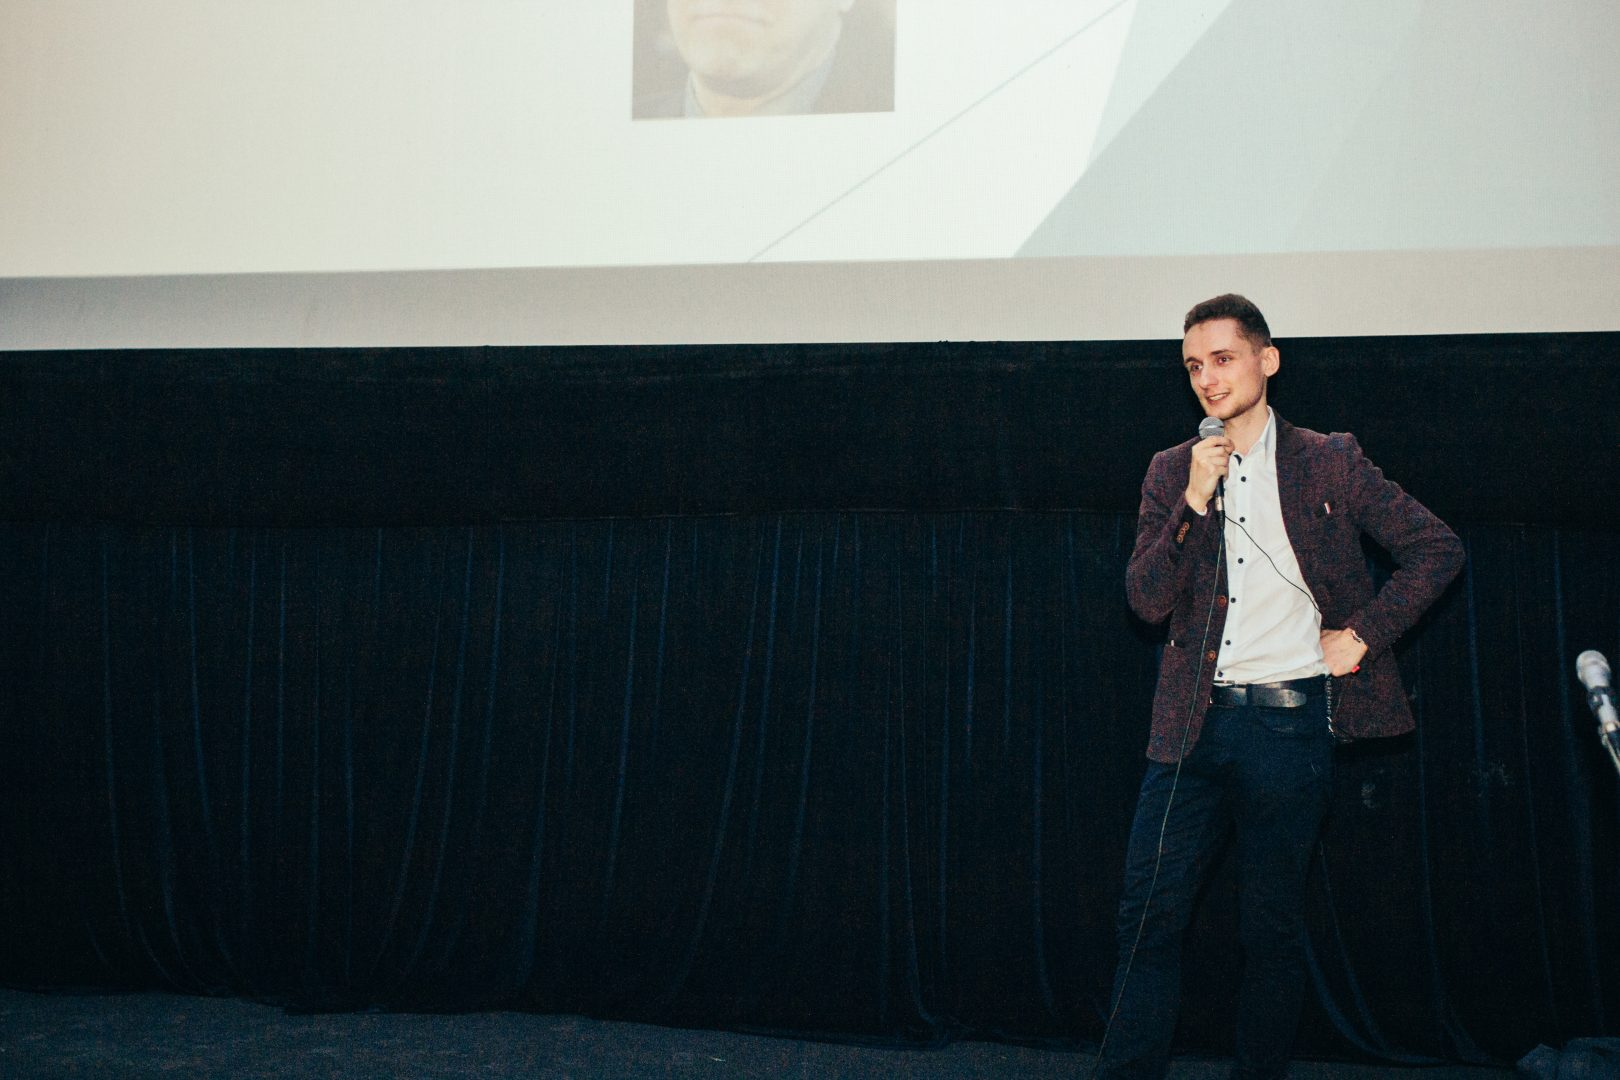 Андрій Глова, Software Engineer в Abto Software